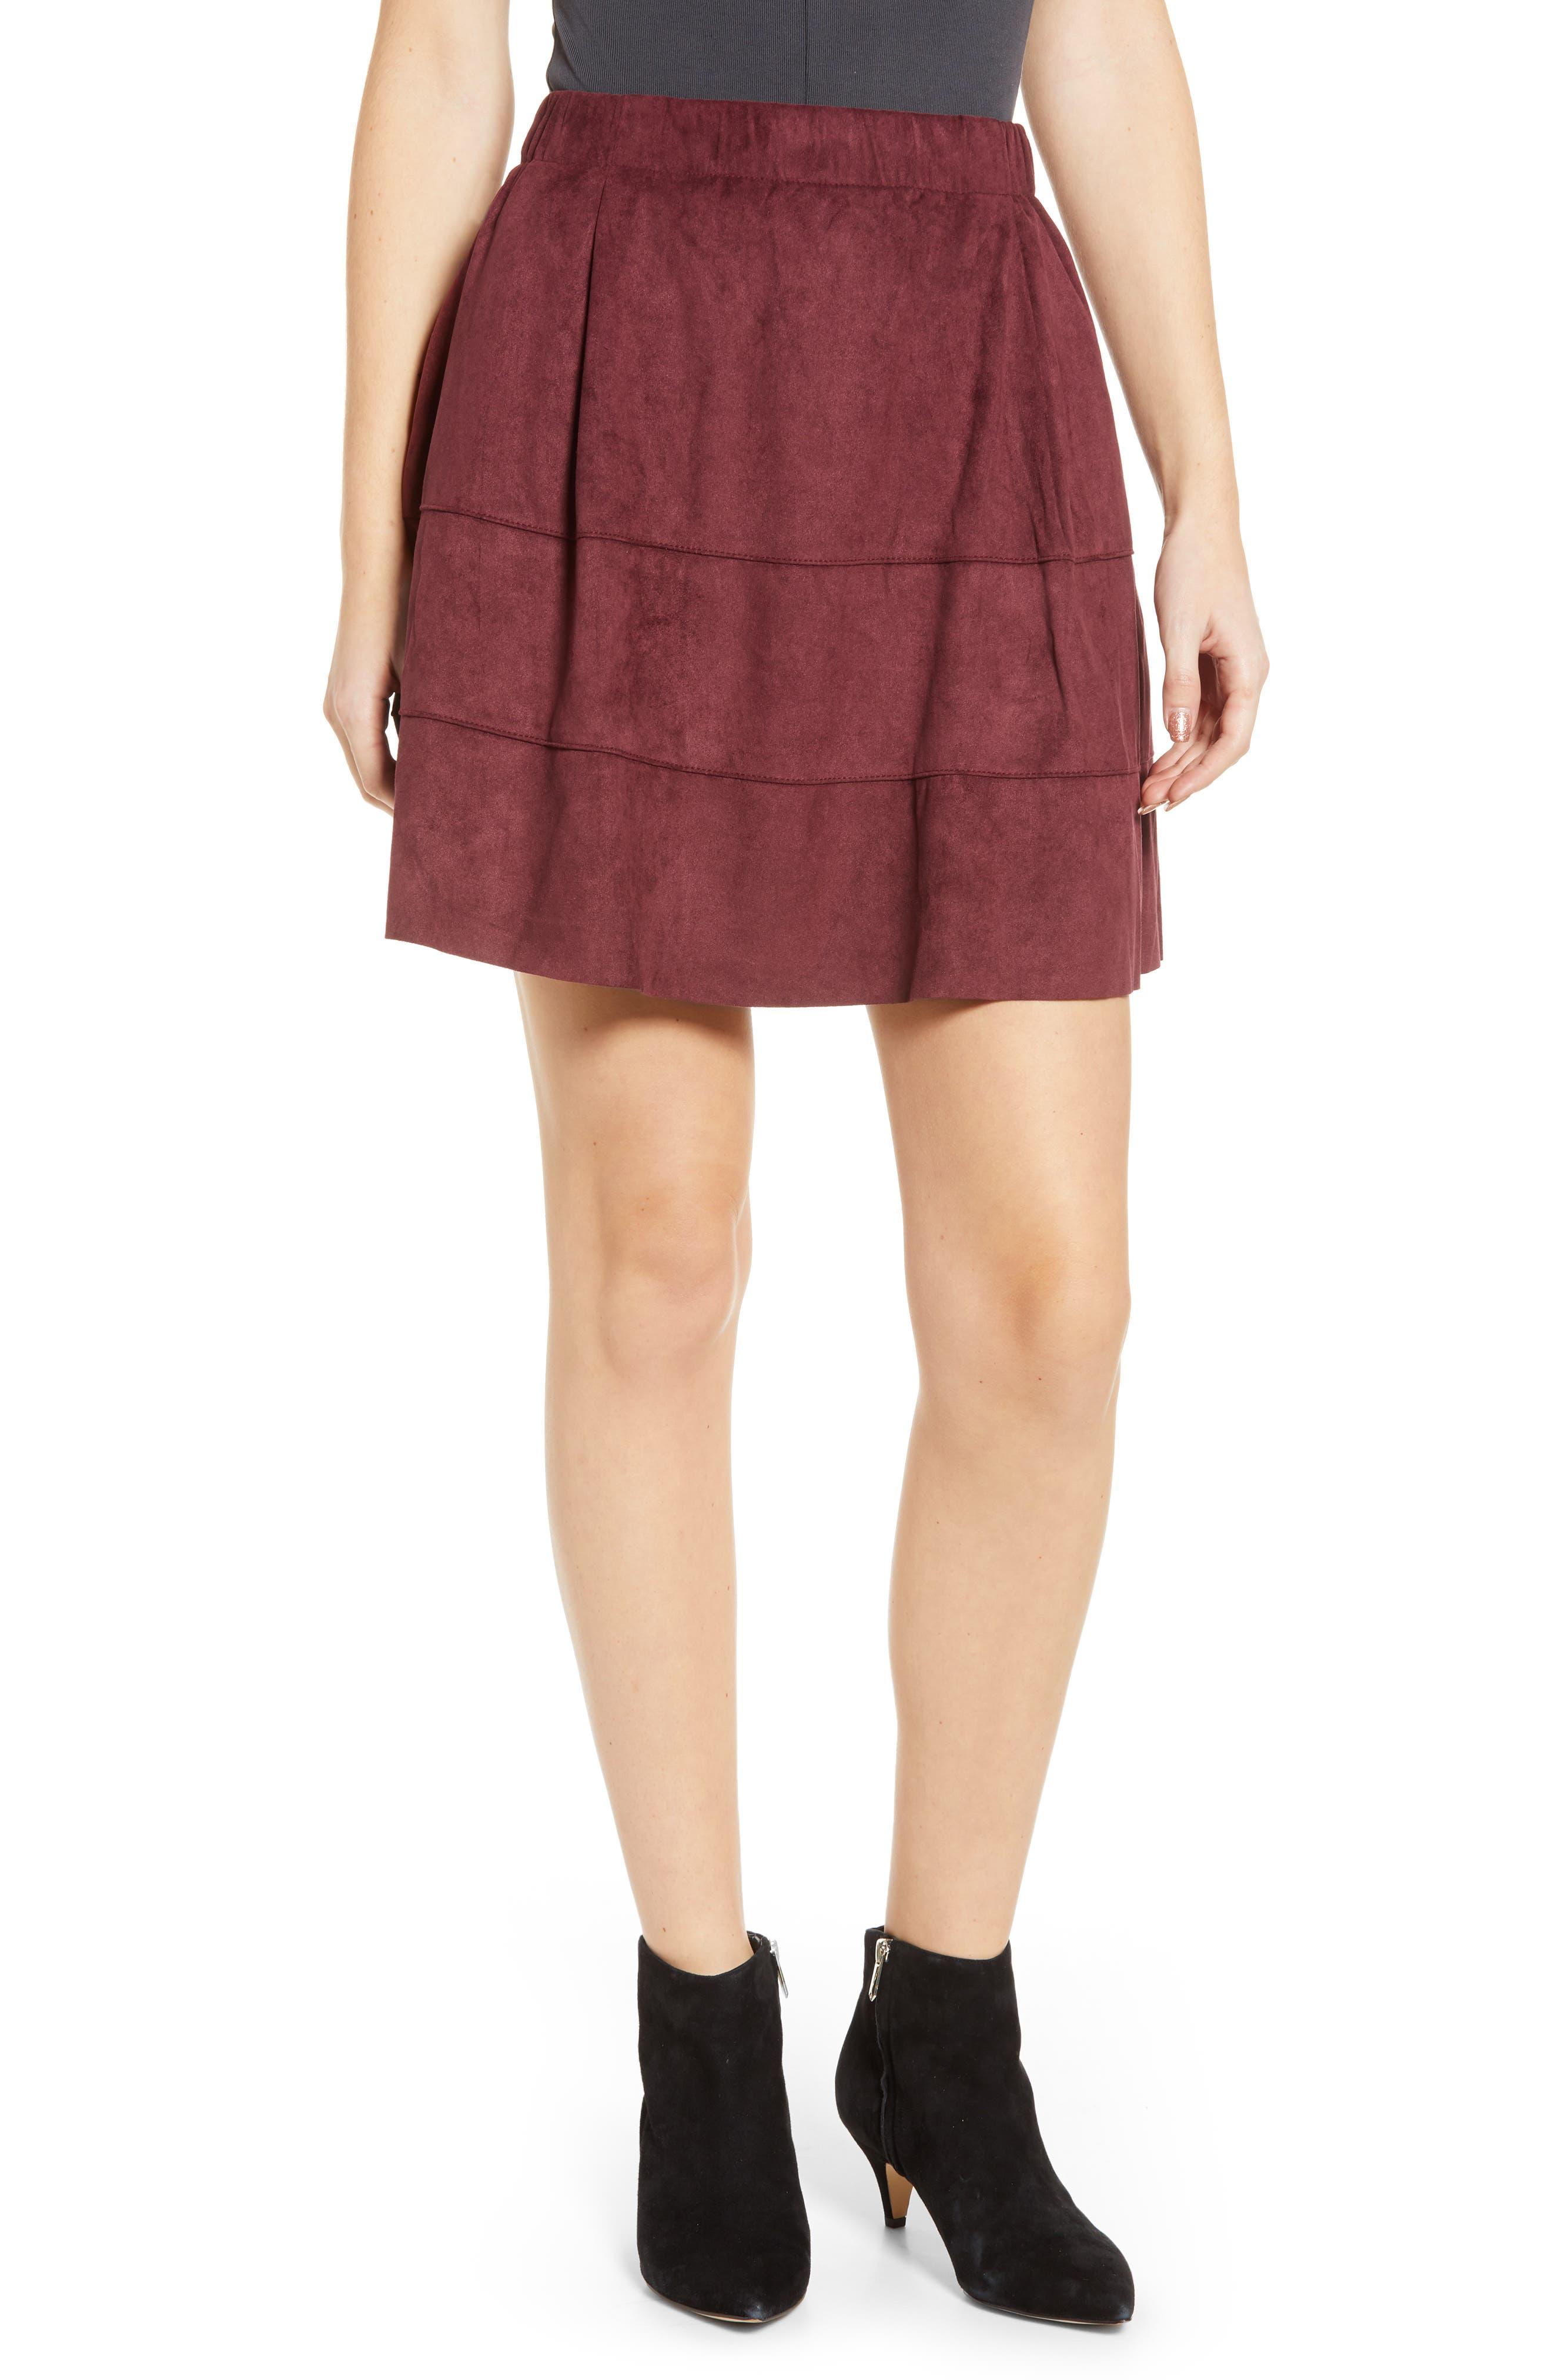 Noisy May Lauren Faux Suede Miniskirt, Burgundy